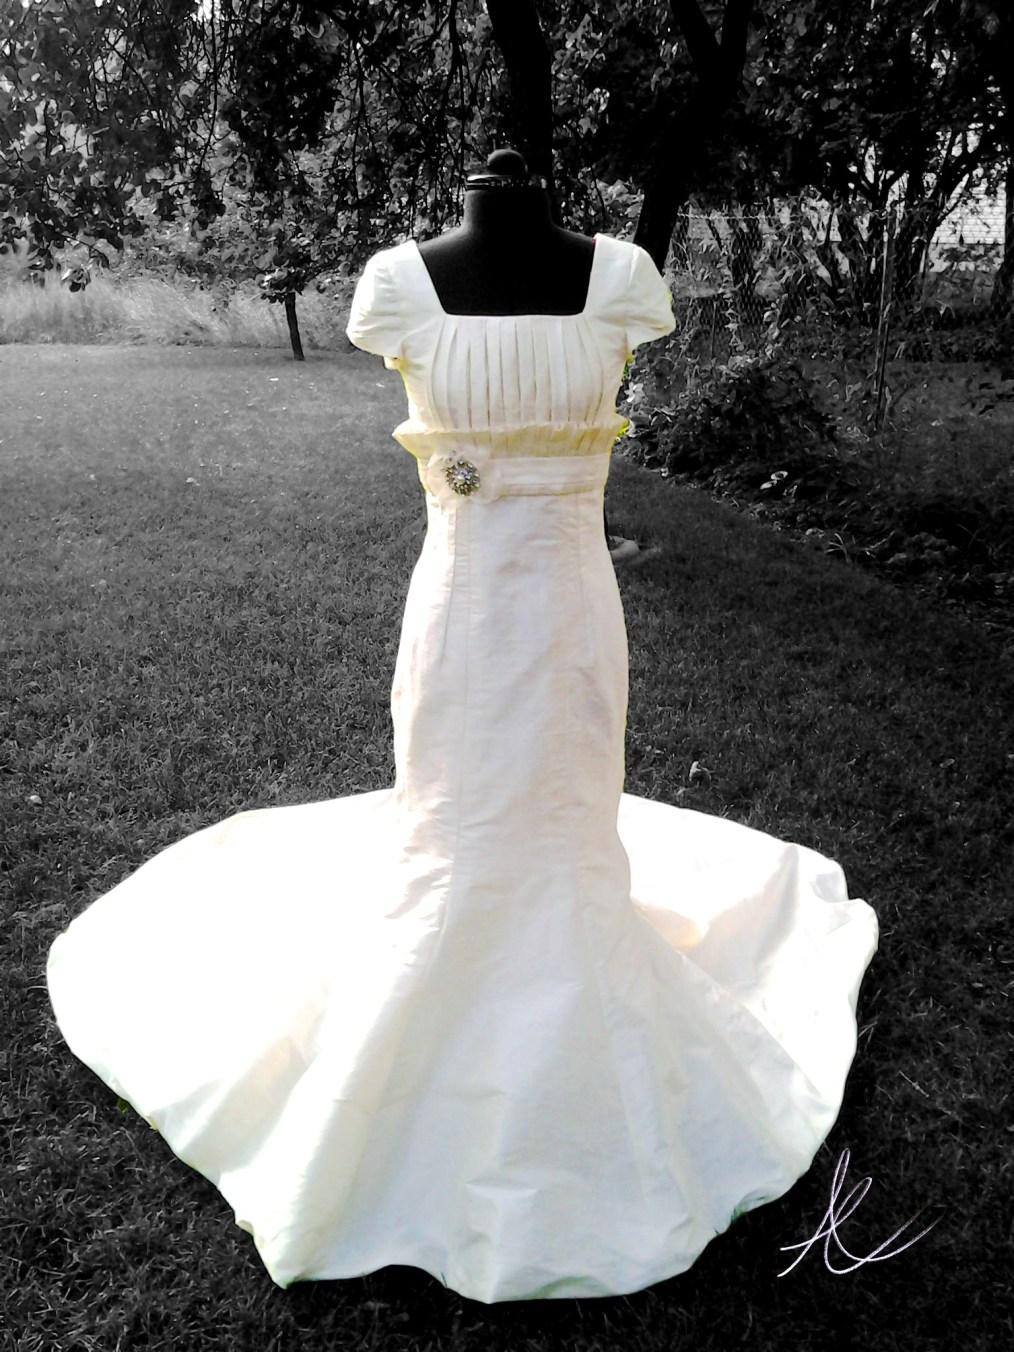 Ruffled wedding dress on outdoor photoshoot